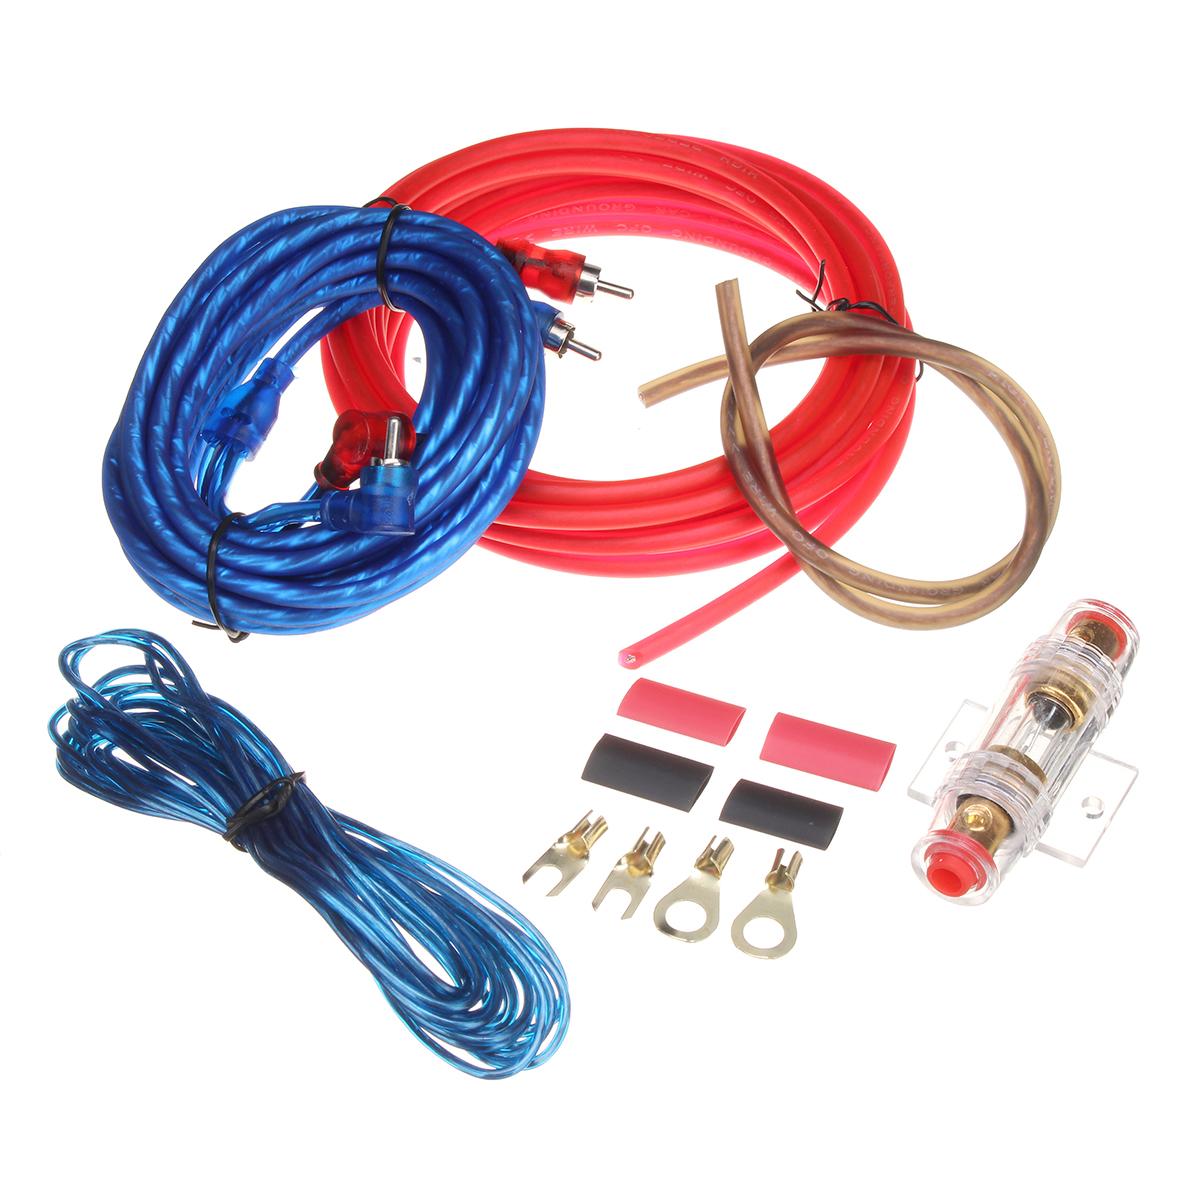 Other Parts Amp Accessories Car Audio Subwoofer Sub